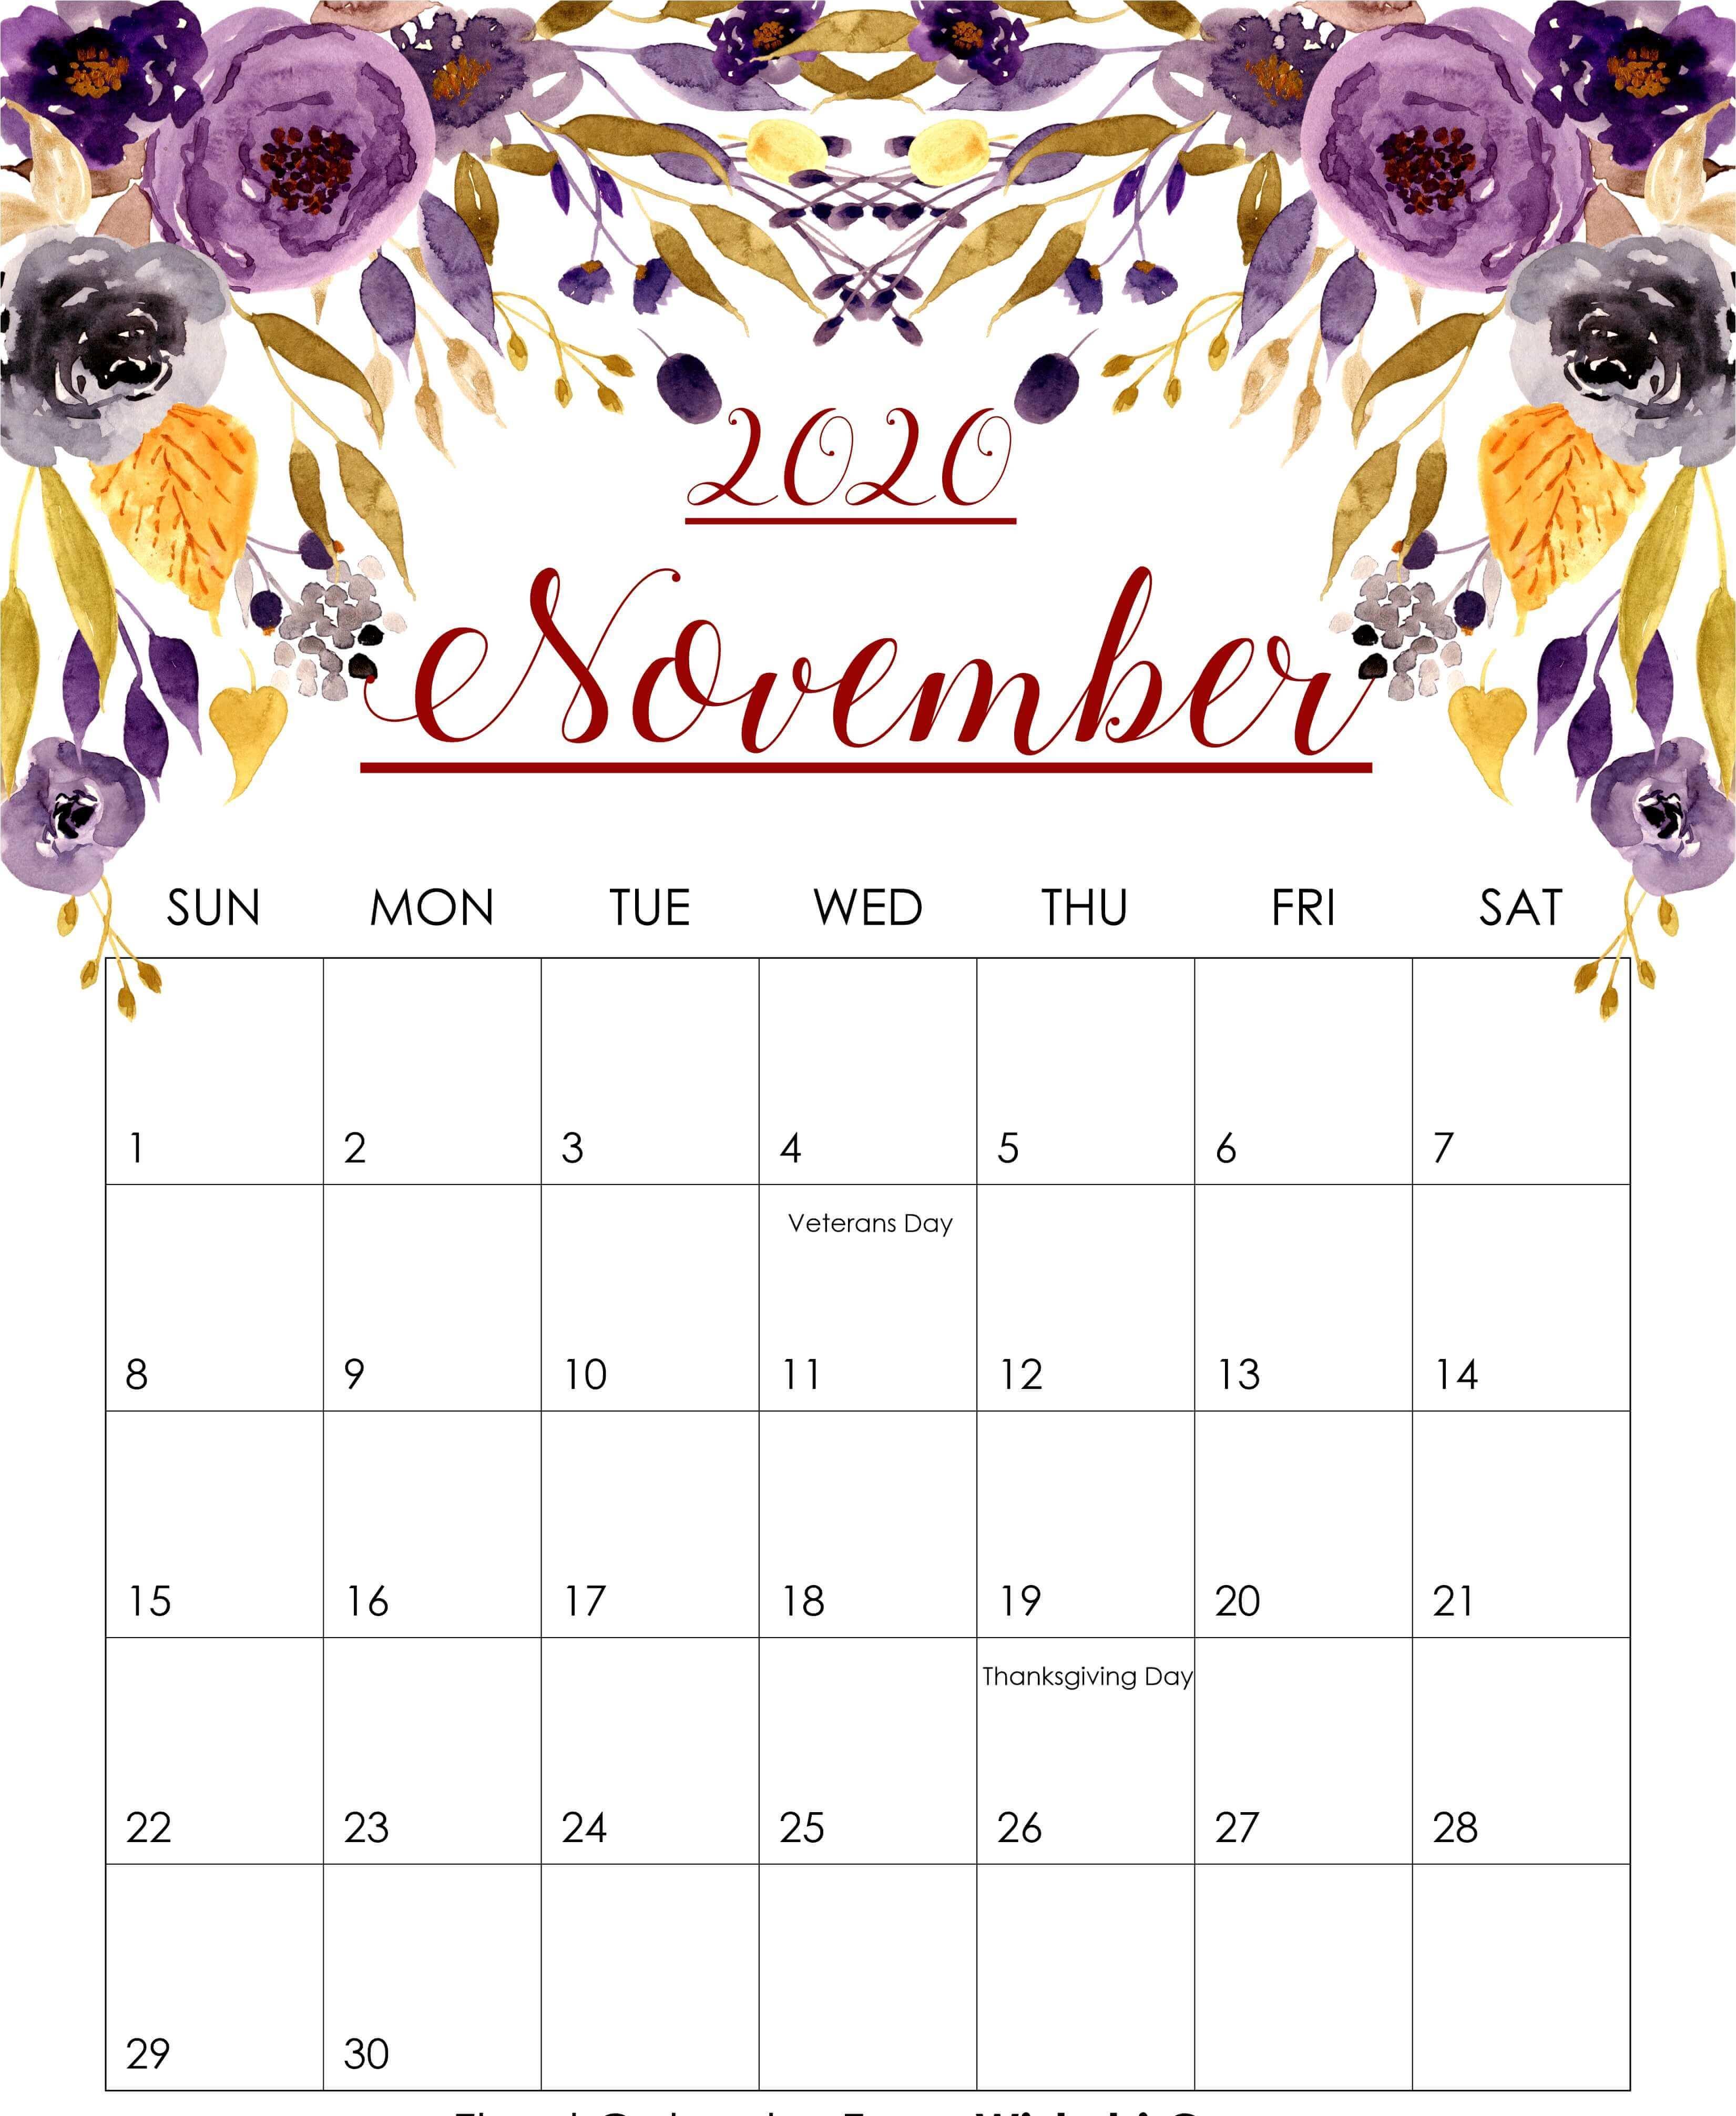 Floral November 2020 Wall Calendar